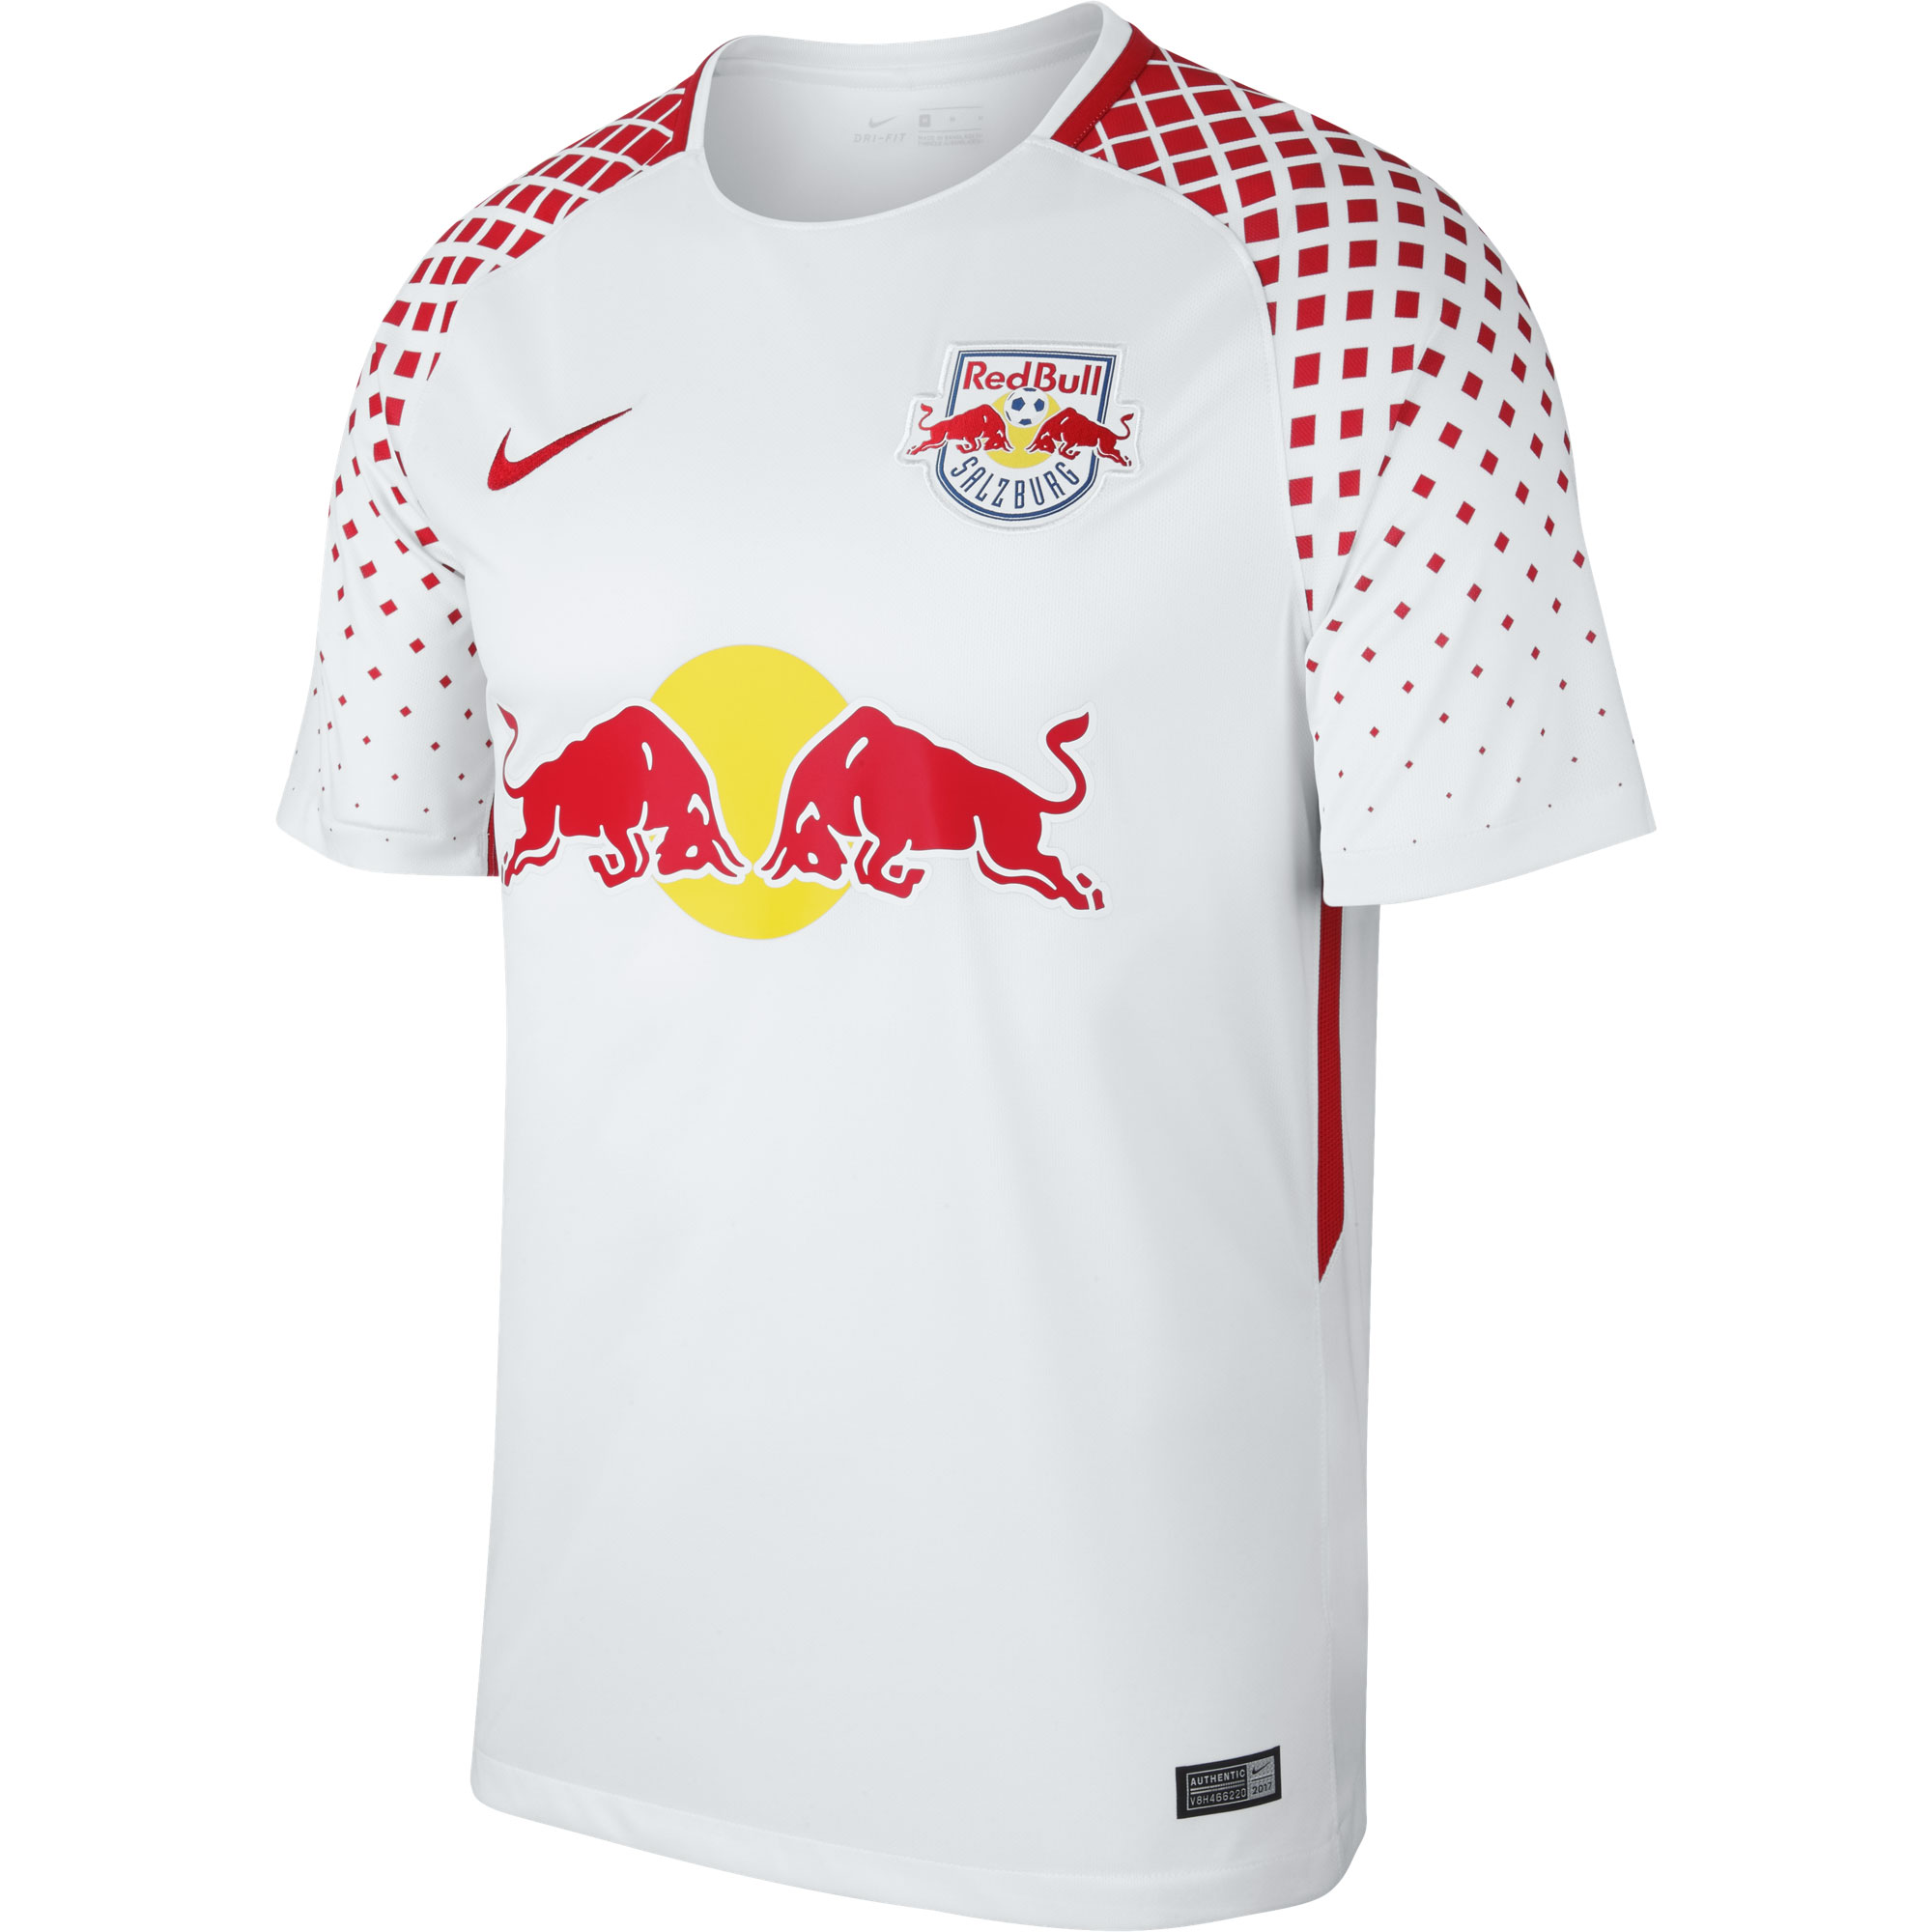 4926921ea7728 Red Bull Salzburg Cup Shirt camisa de futebol 2017 - 2018. Sponsored ...